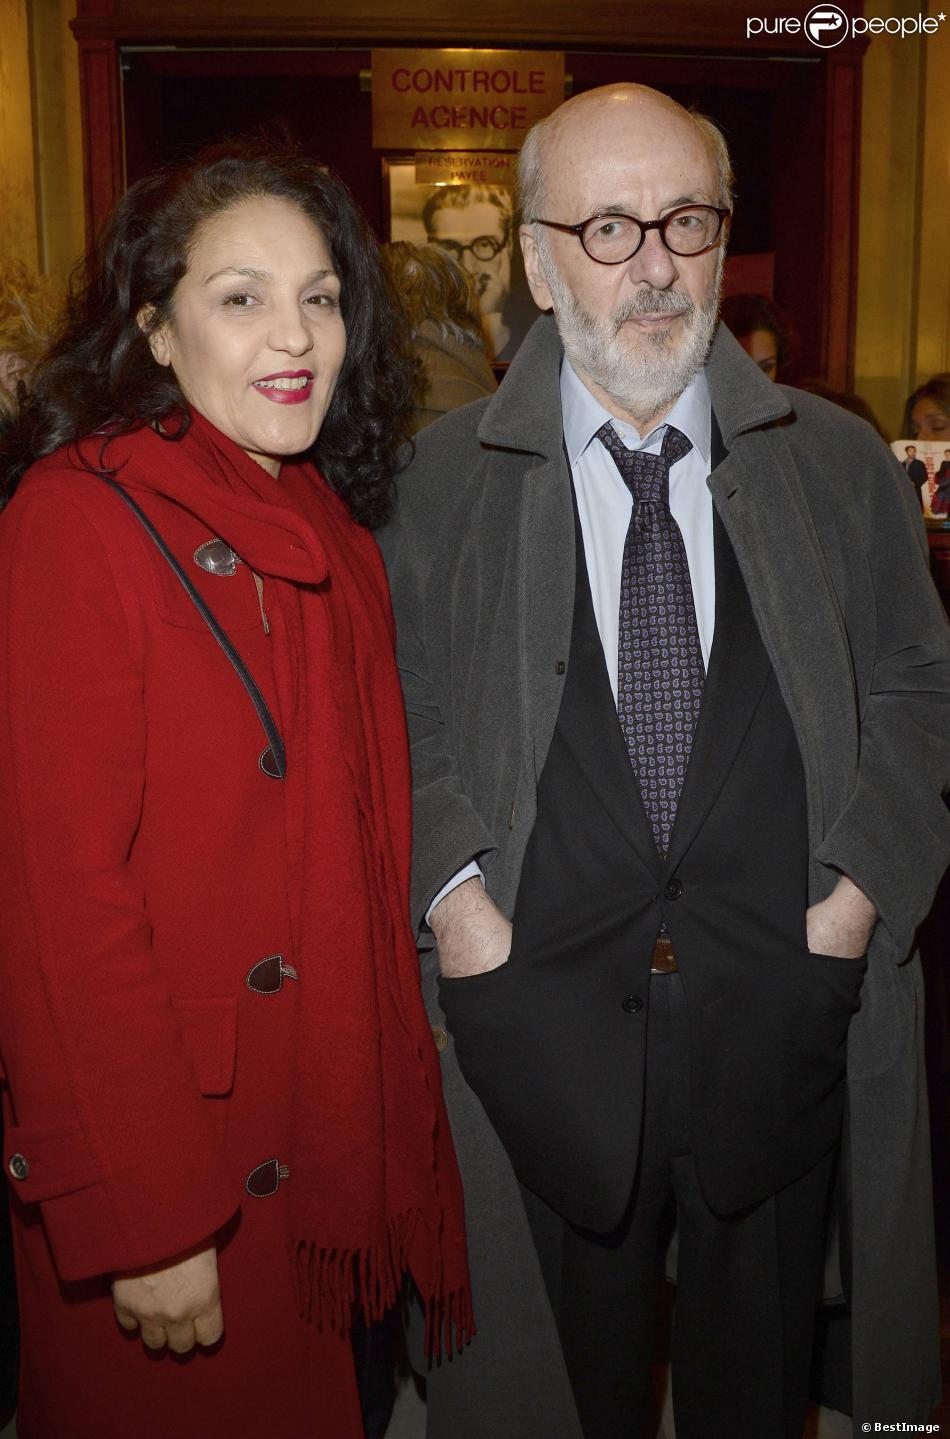 Bertrand blier et sa femme farida rahouadj la g n rale de la pi ce la porte c t au th tre - Piece de theatre la porte a cote ...